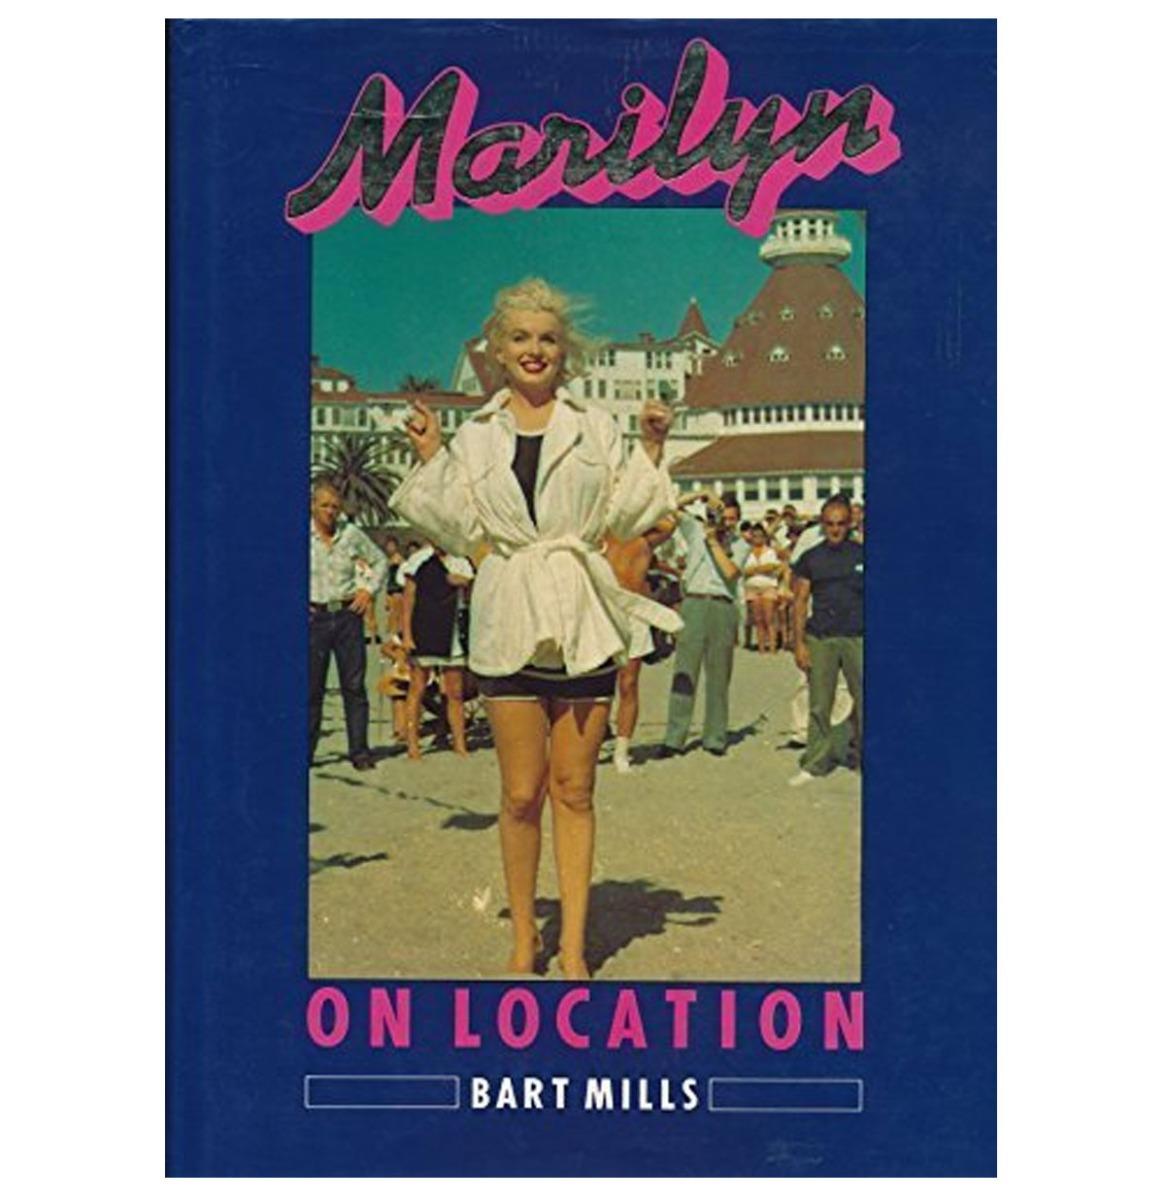 Marilyn Monroe - Marilyn On Location Boek Hardcover Collectible